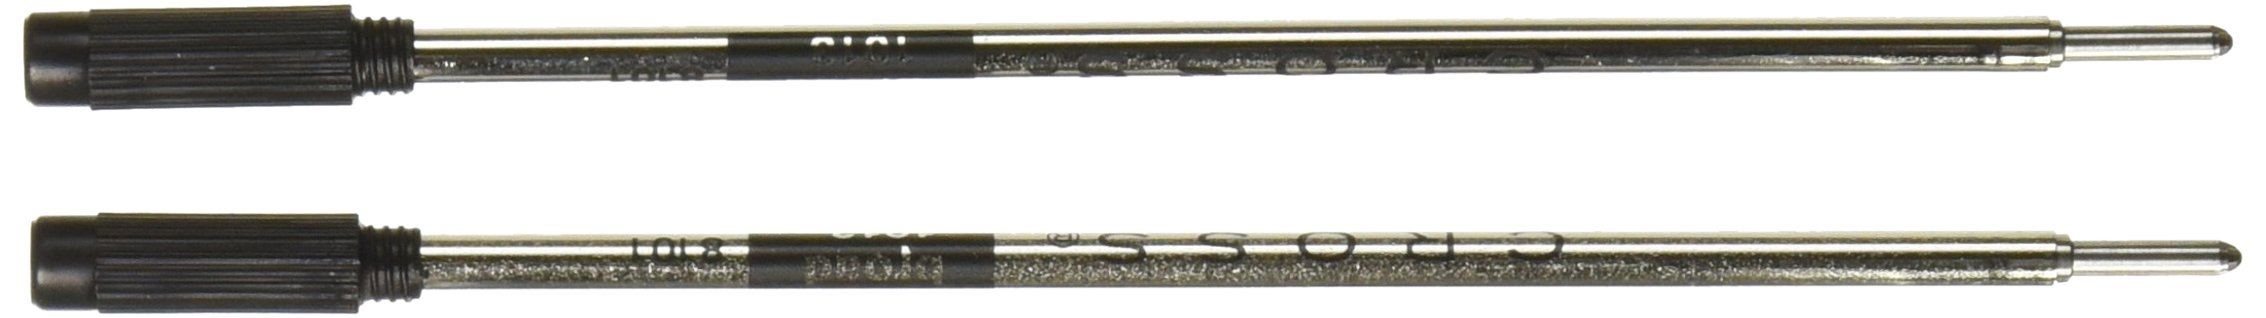 Cross Ballpoint Pen Refill 12-Pack Black Broad by Cross (Image #1)